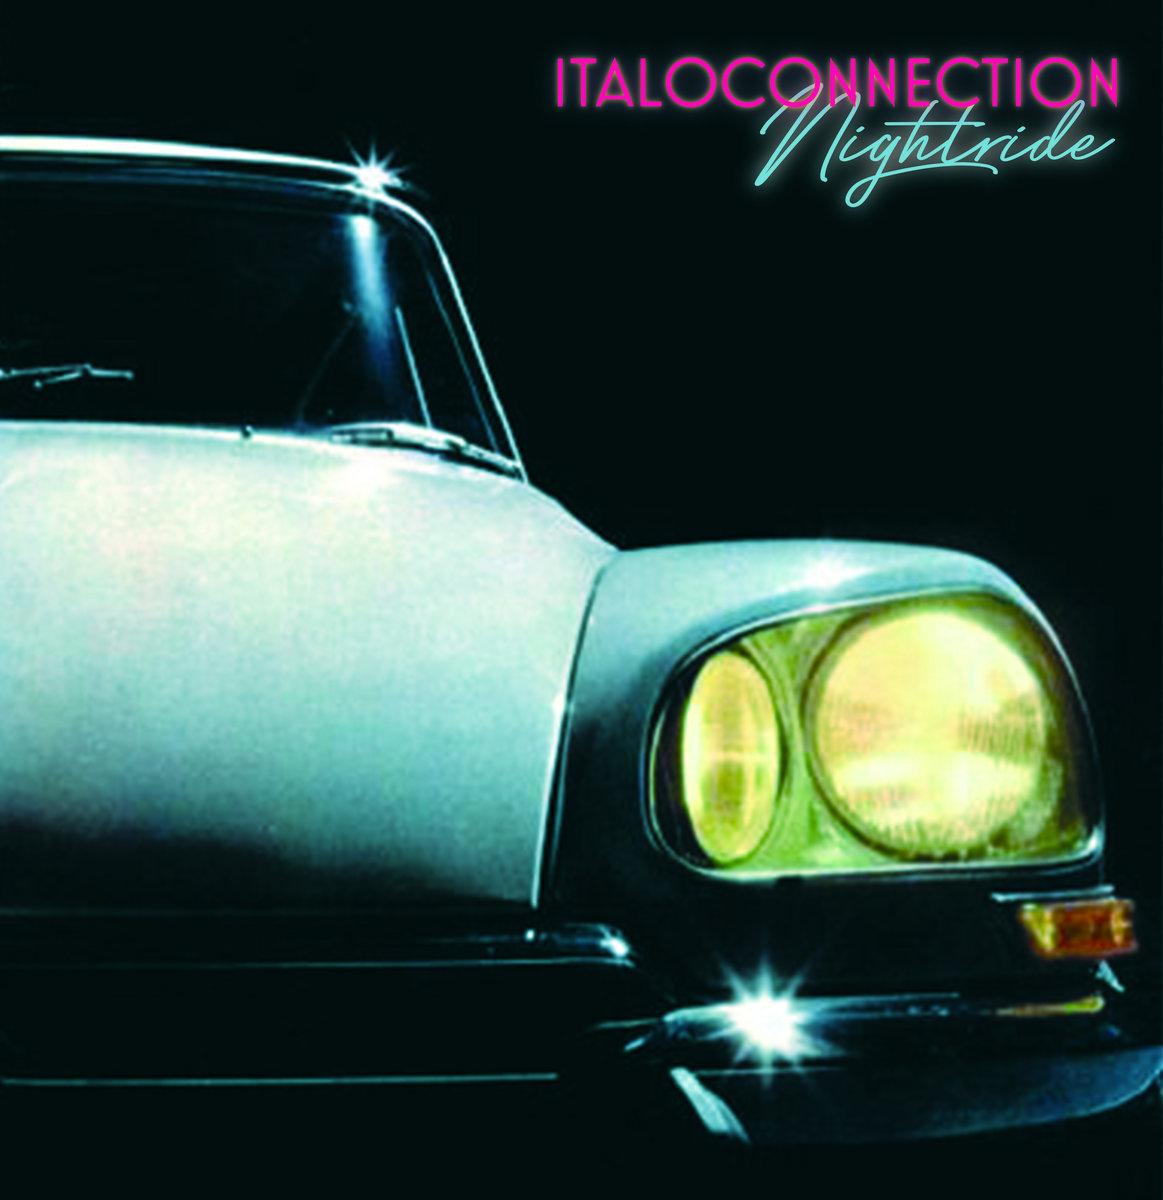 Italoconnection - Nightride